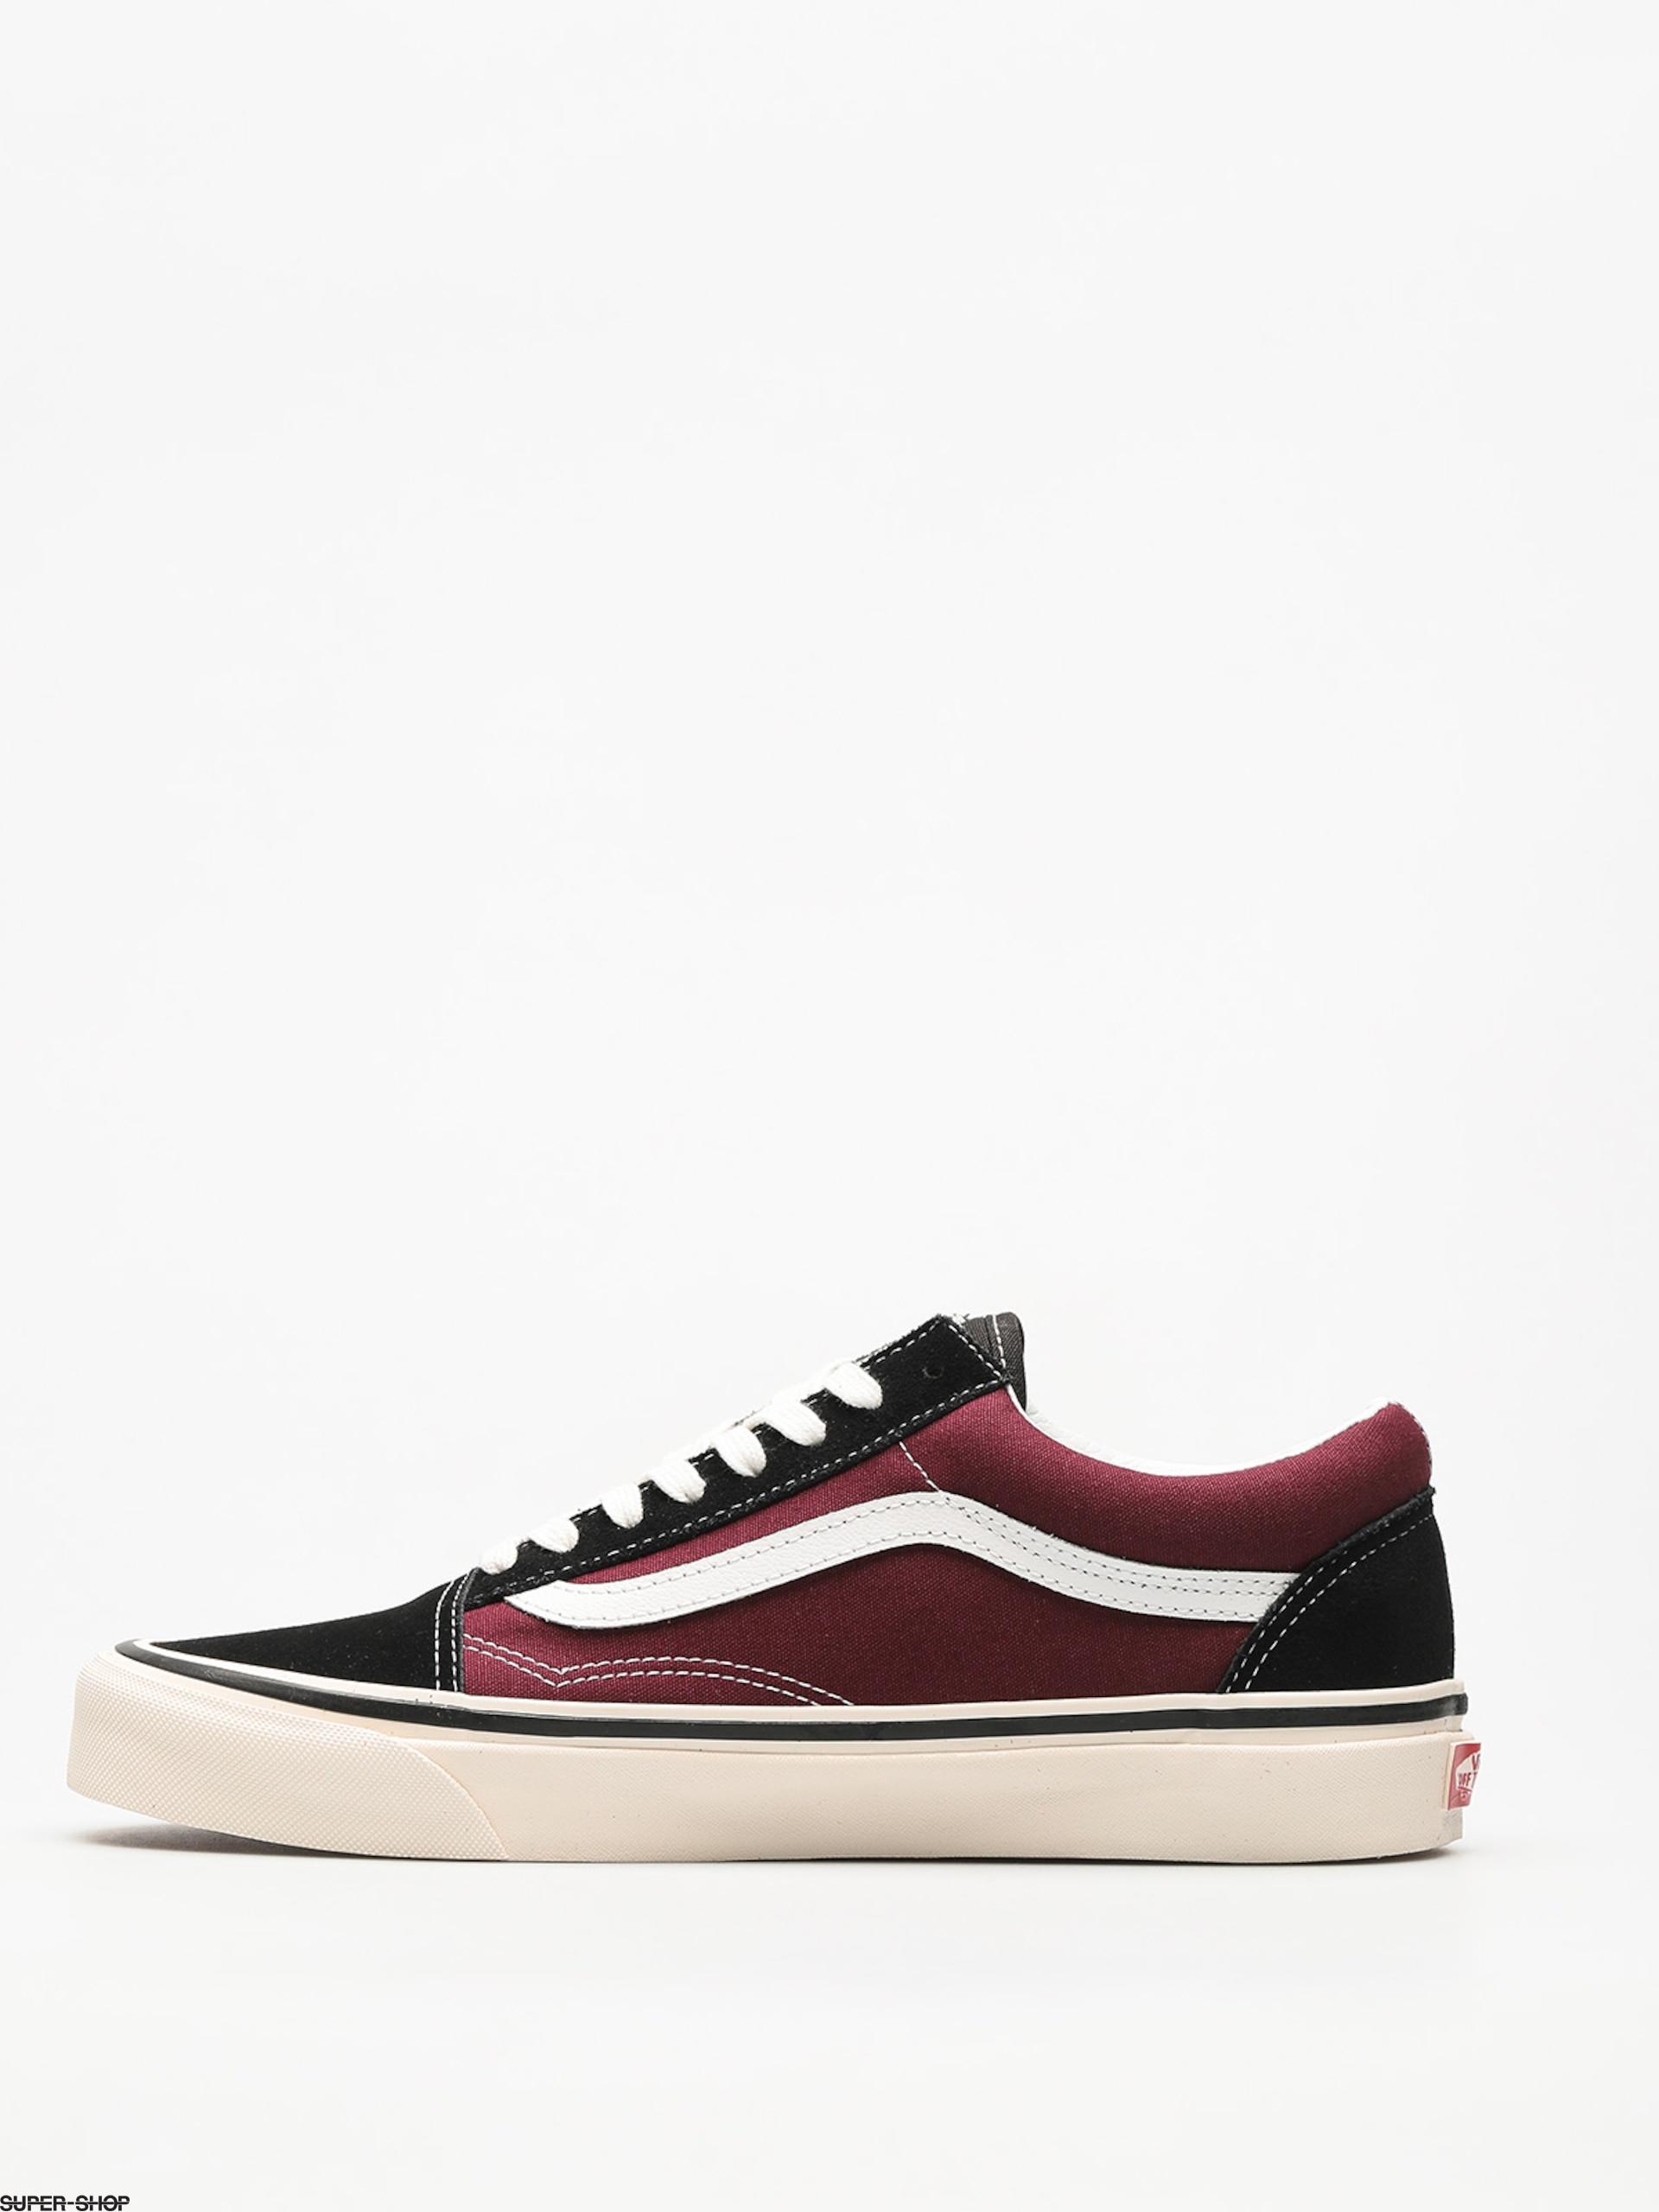 Vans Shoes Old Skool 36 Dx (anaheim